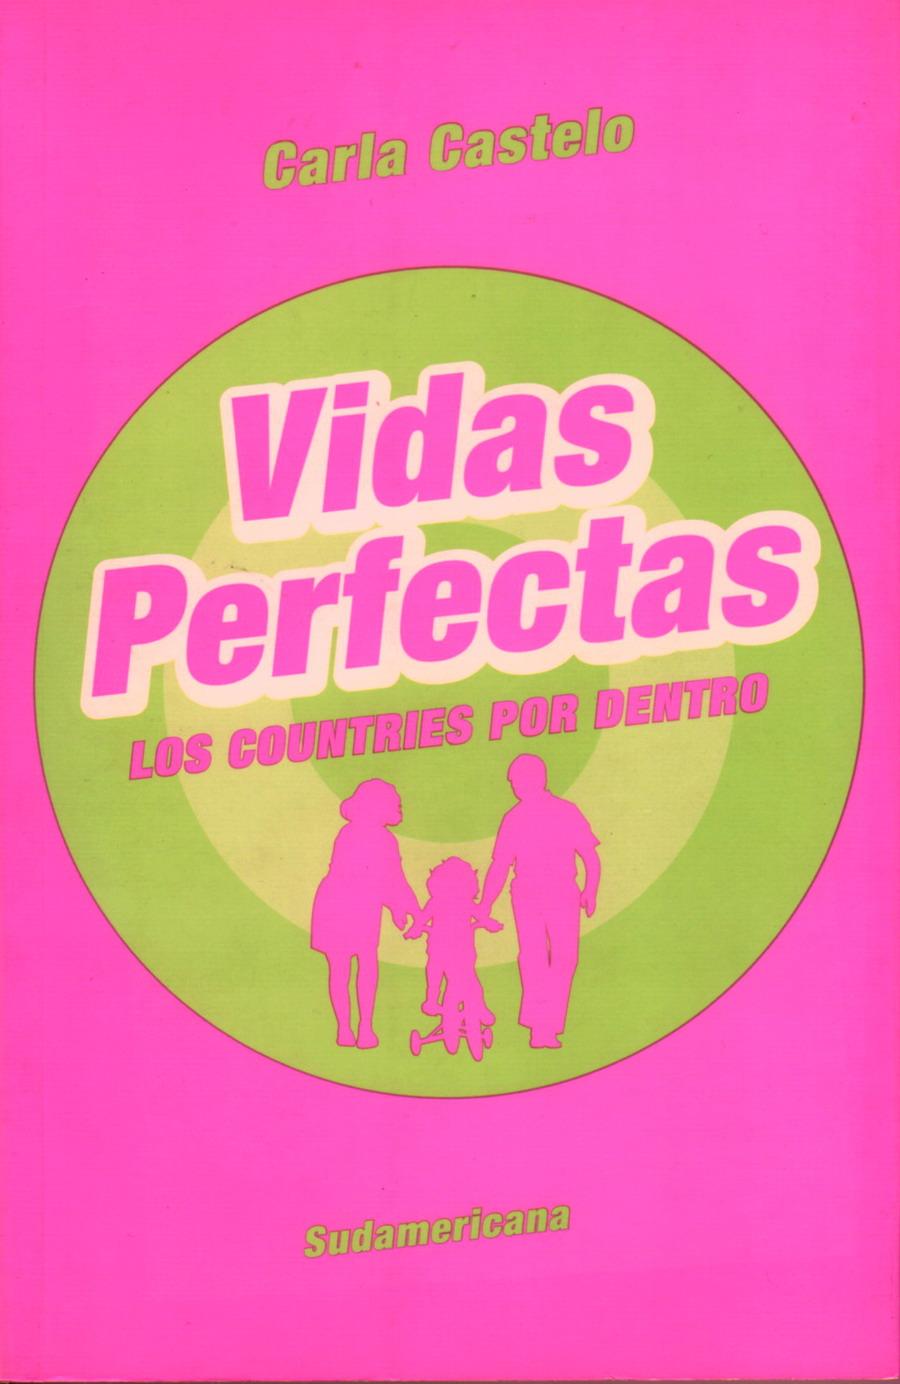 Vidas perfectas